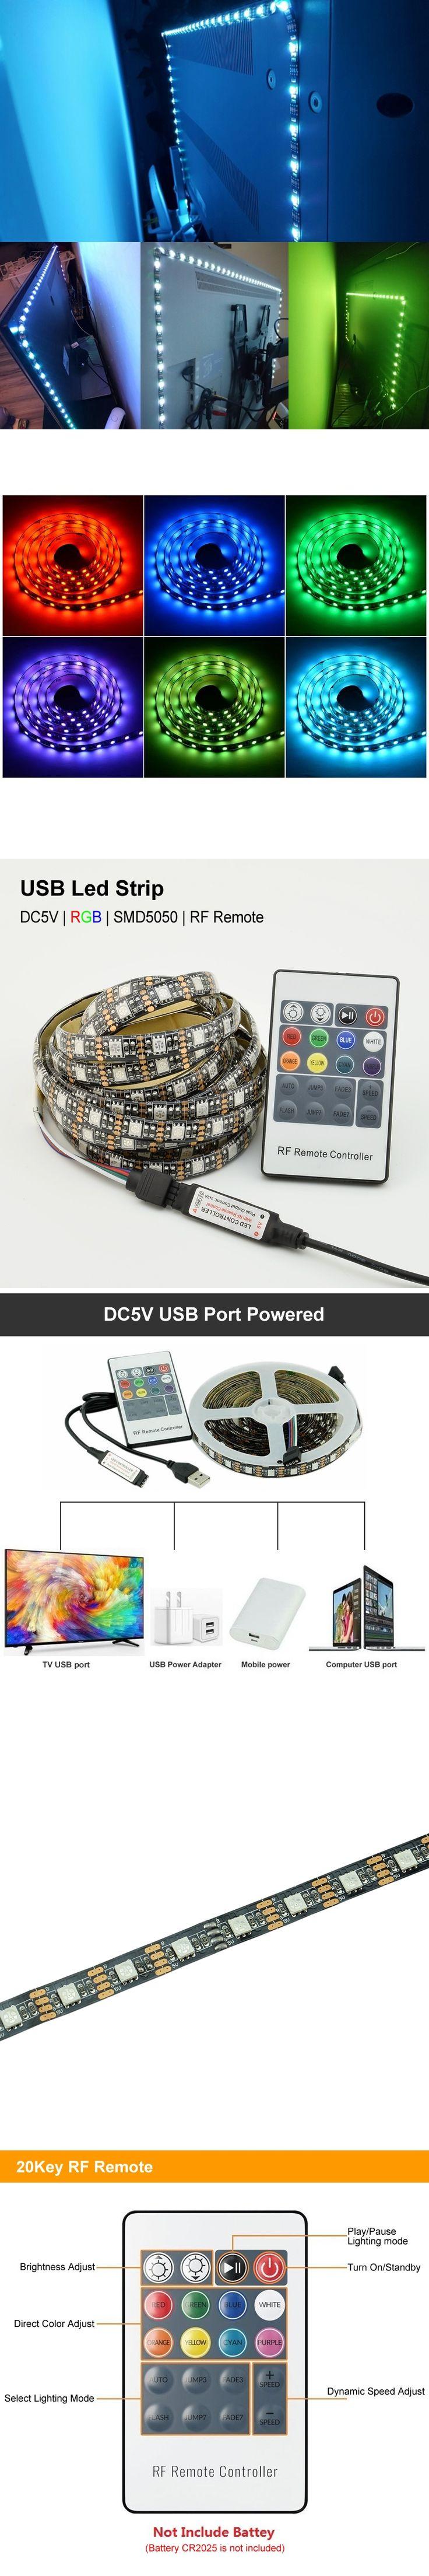 USB RGB Led Strip 5050 LED Home Theater TV BackLight Accent Back Lighting Kit Bias Multi-Color Strips RGB LED Strip IP20 / IP65